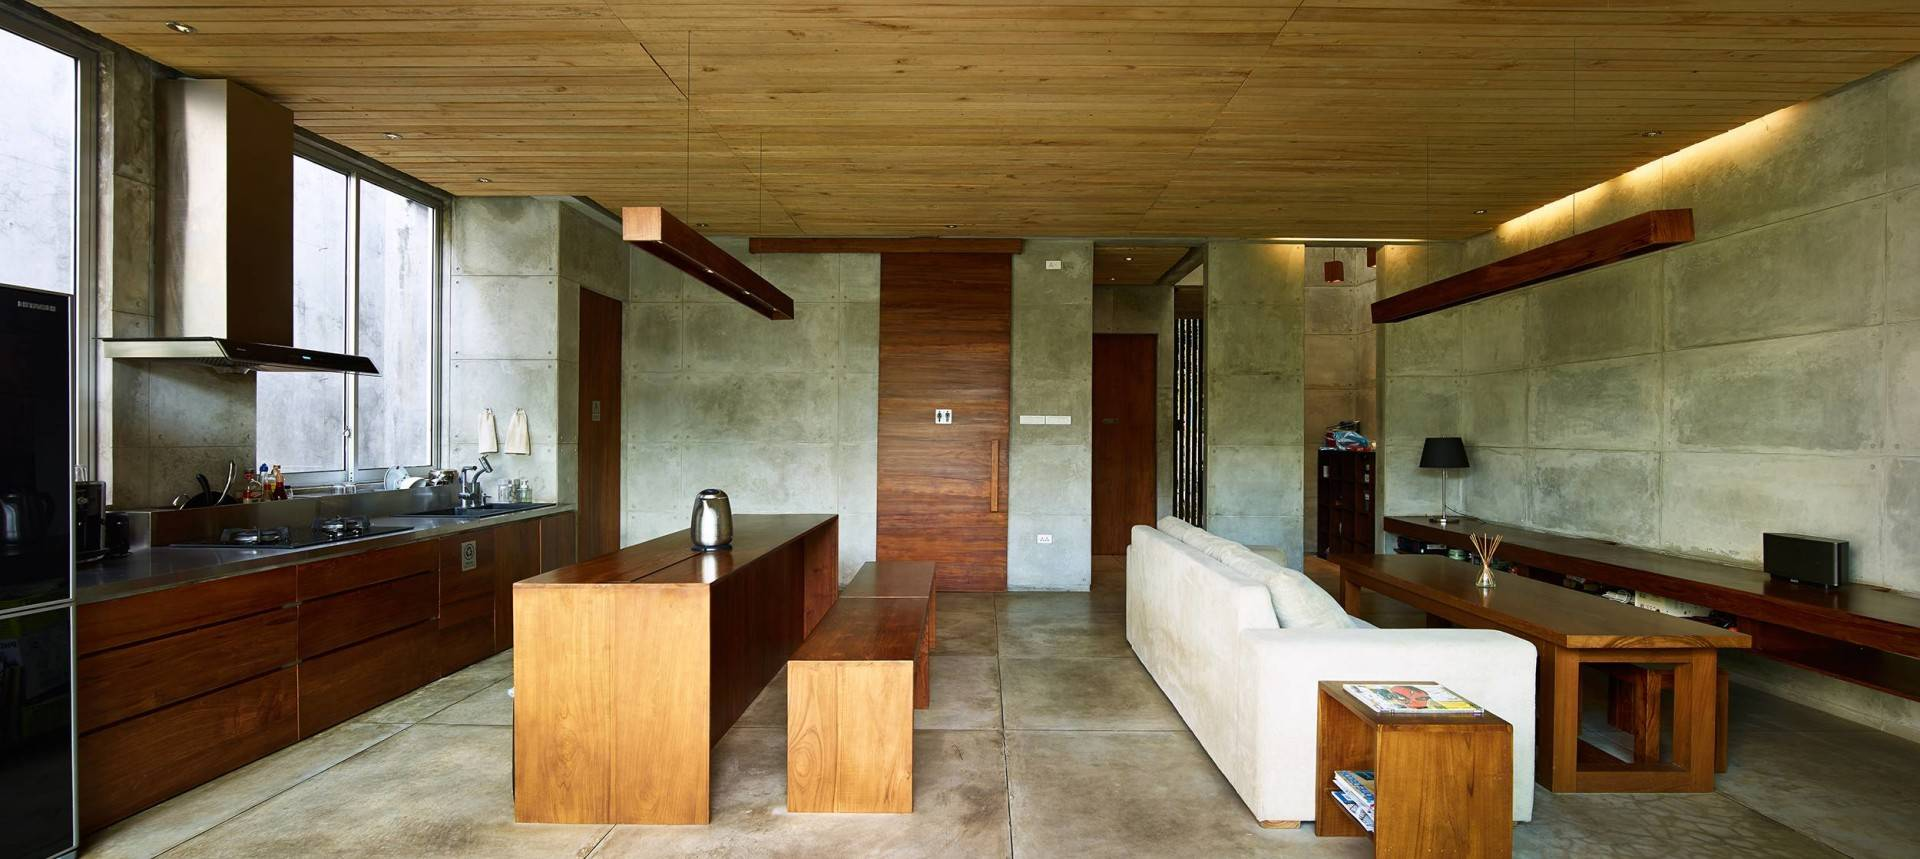 Raw Architecture Bare Minimalist Jakarta, Indonesia Jakarta, Indonesia Living Room   1541